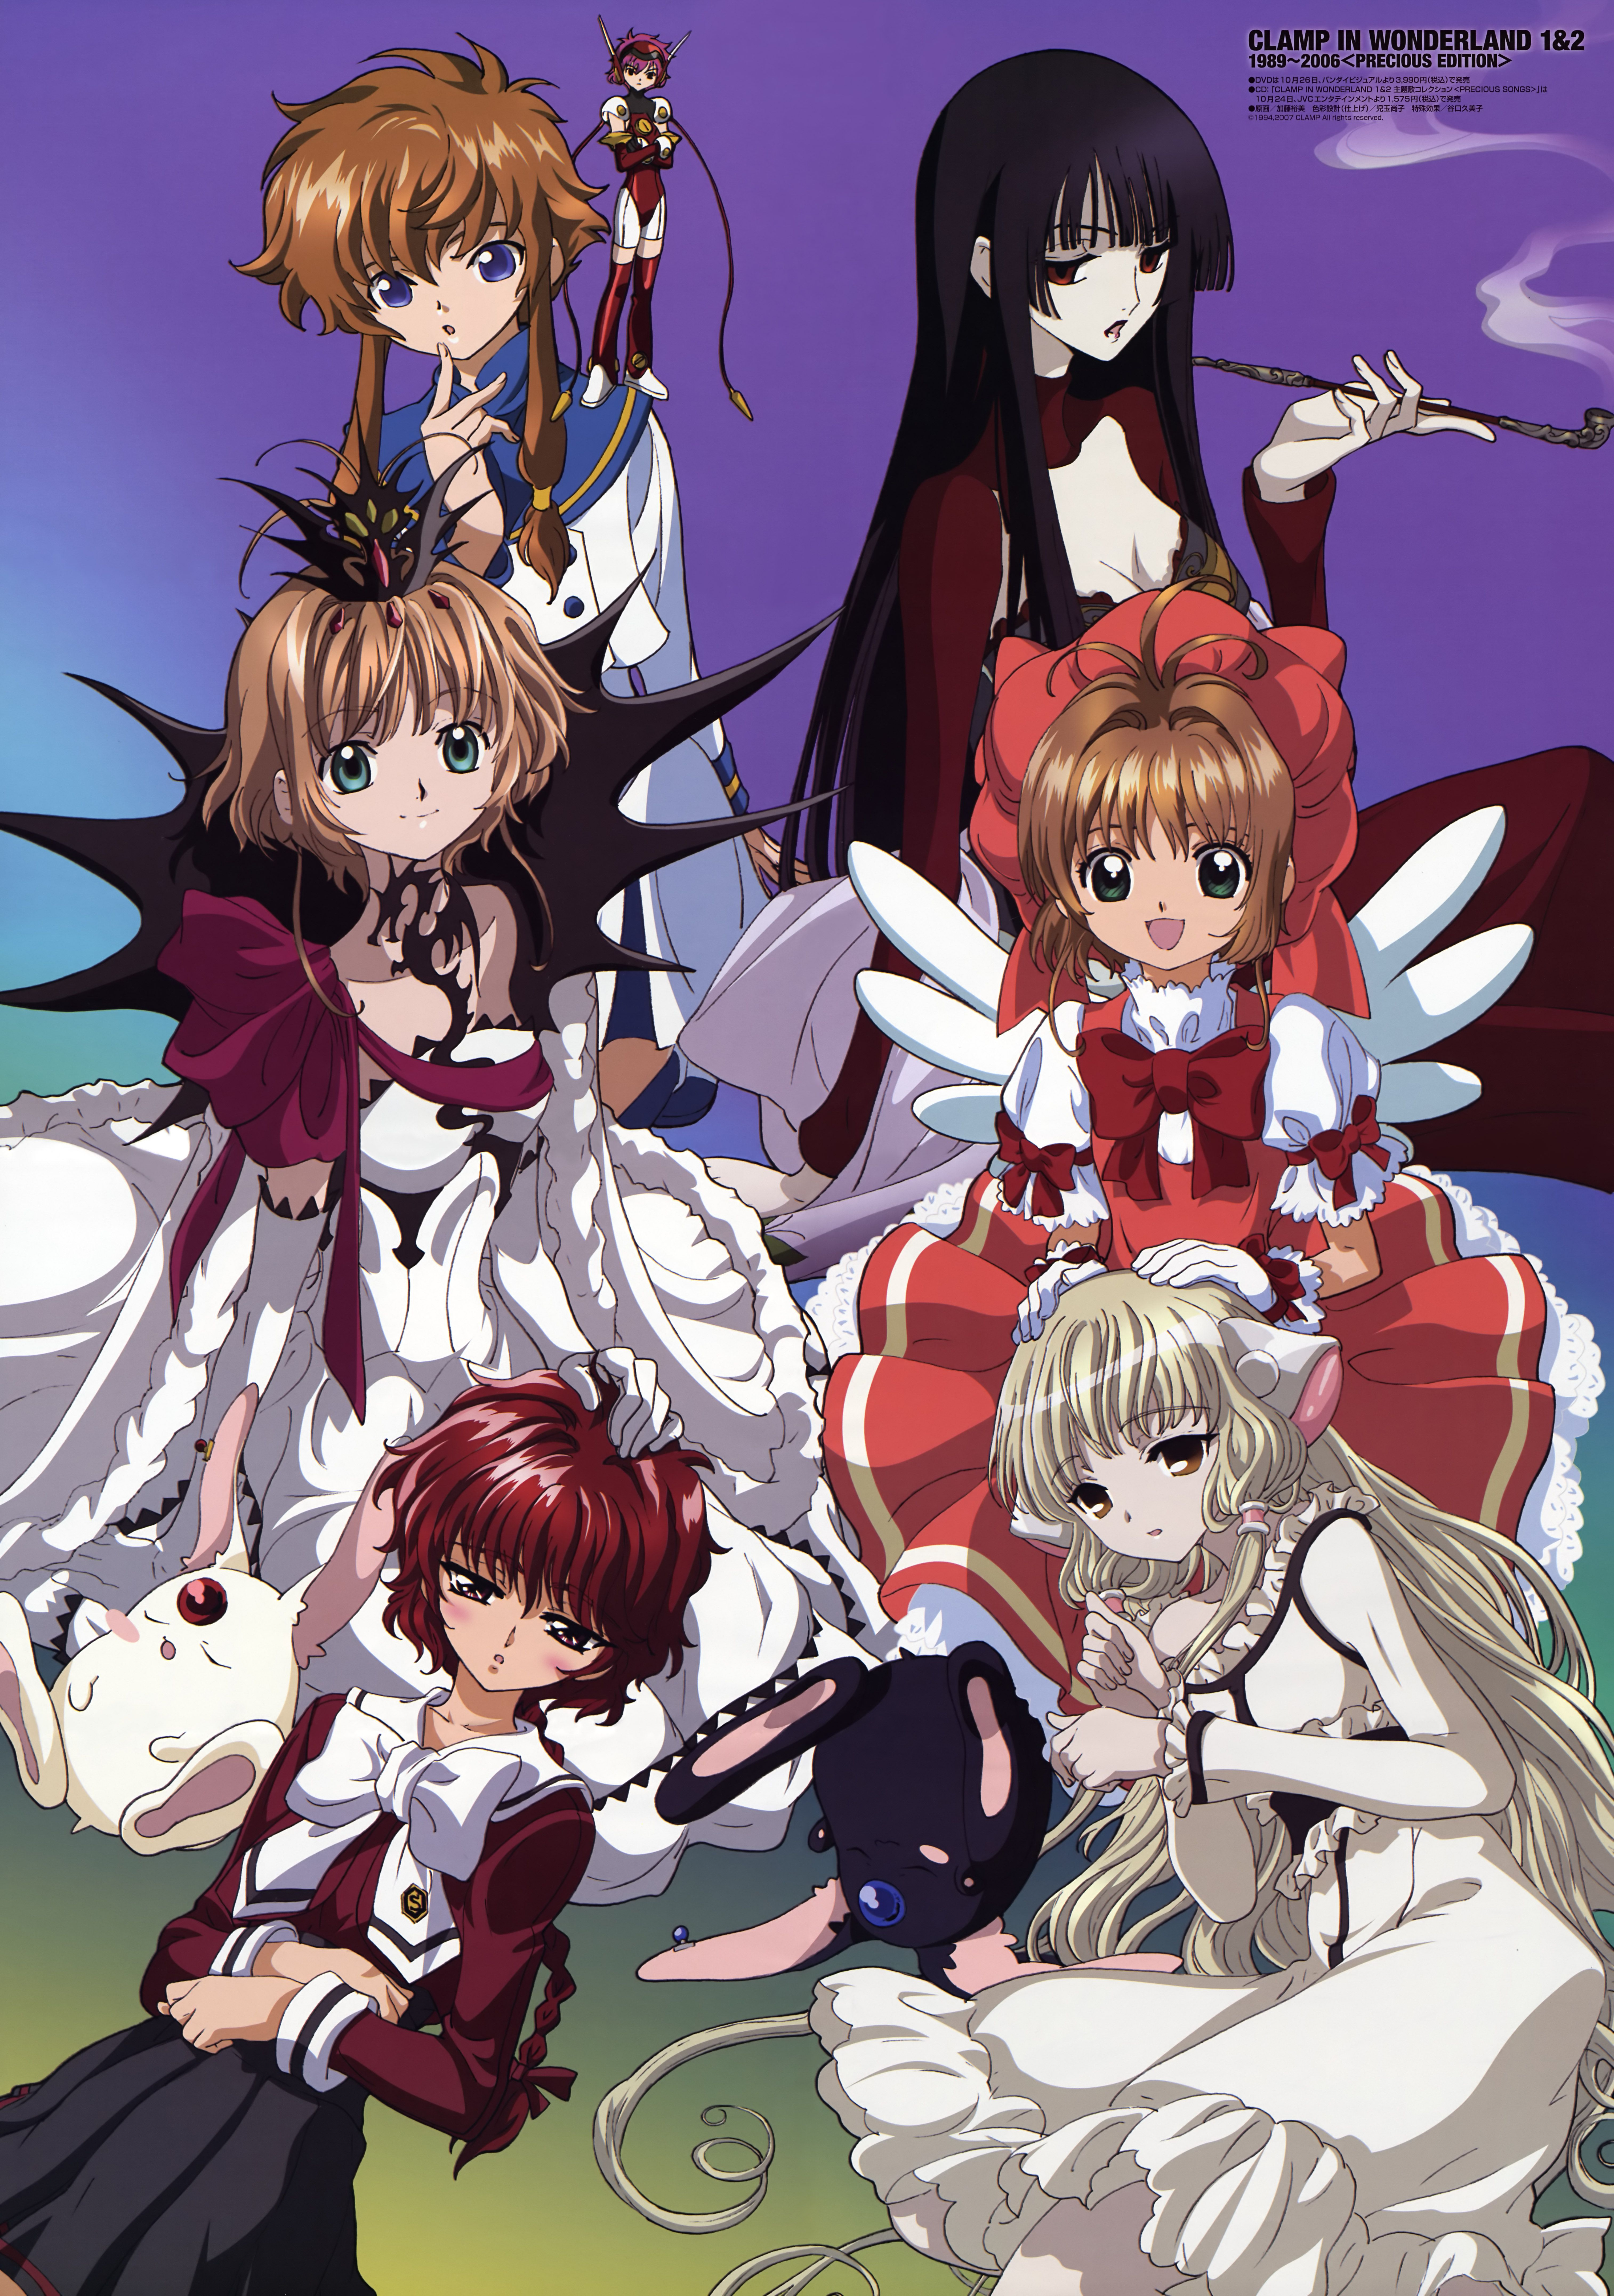 CLAMP - Angelic Layer, XXXHolic, Tsubasa REsevoir Chronicles, Cardcaptor Sakura, Chobits, Magic Knight Rayearth